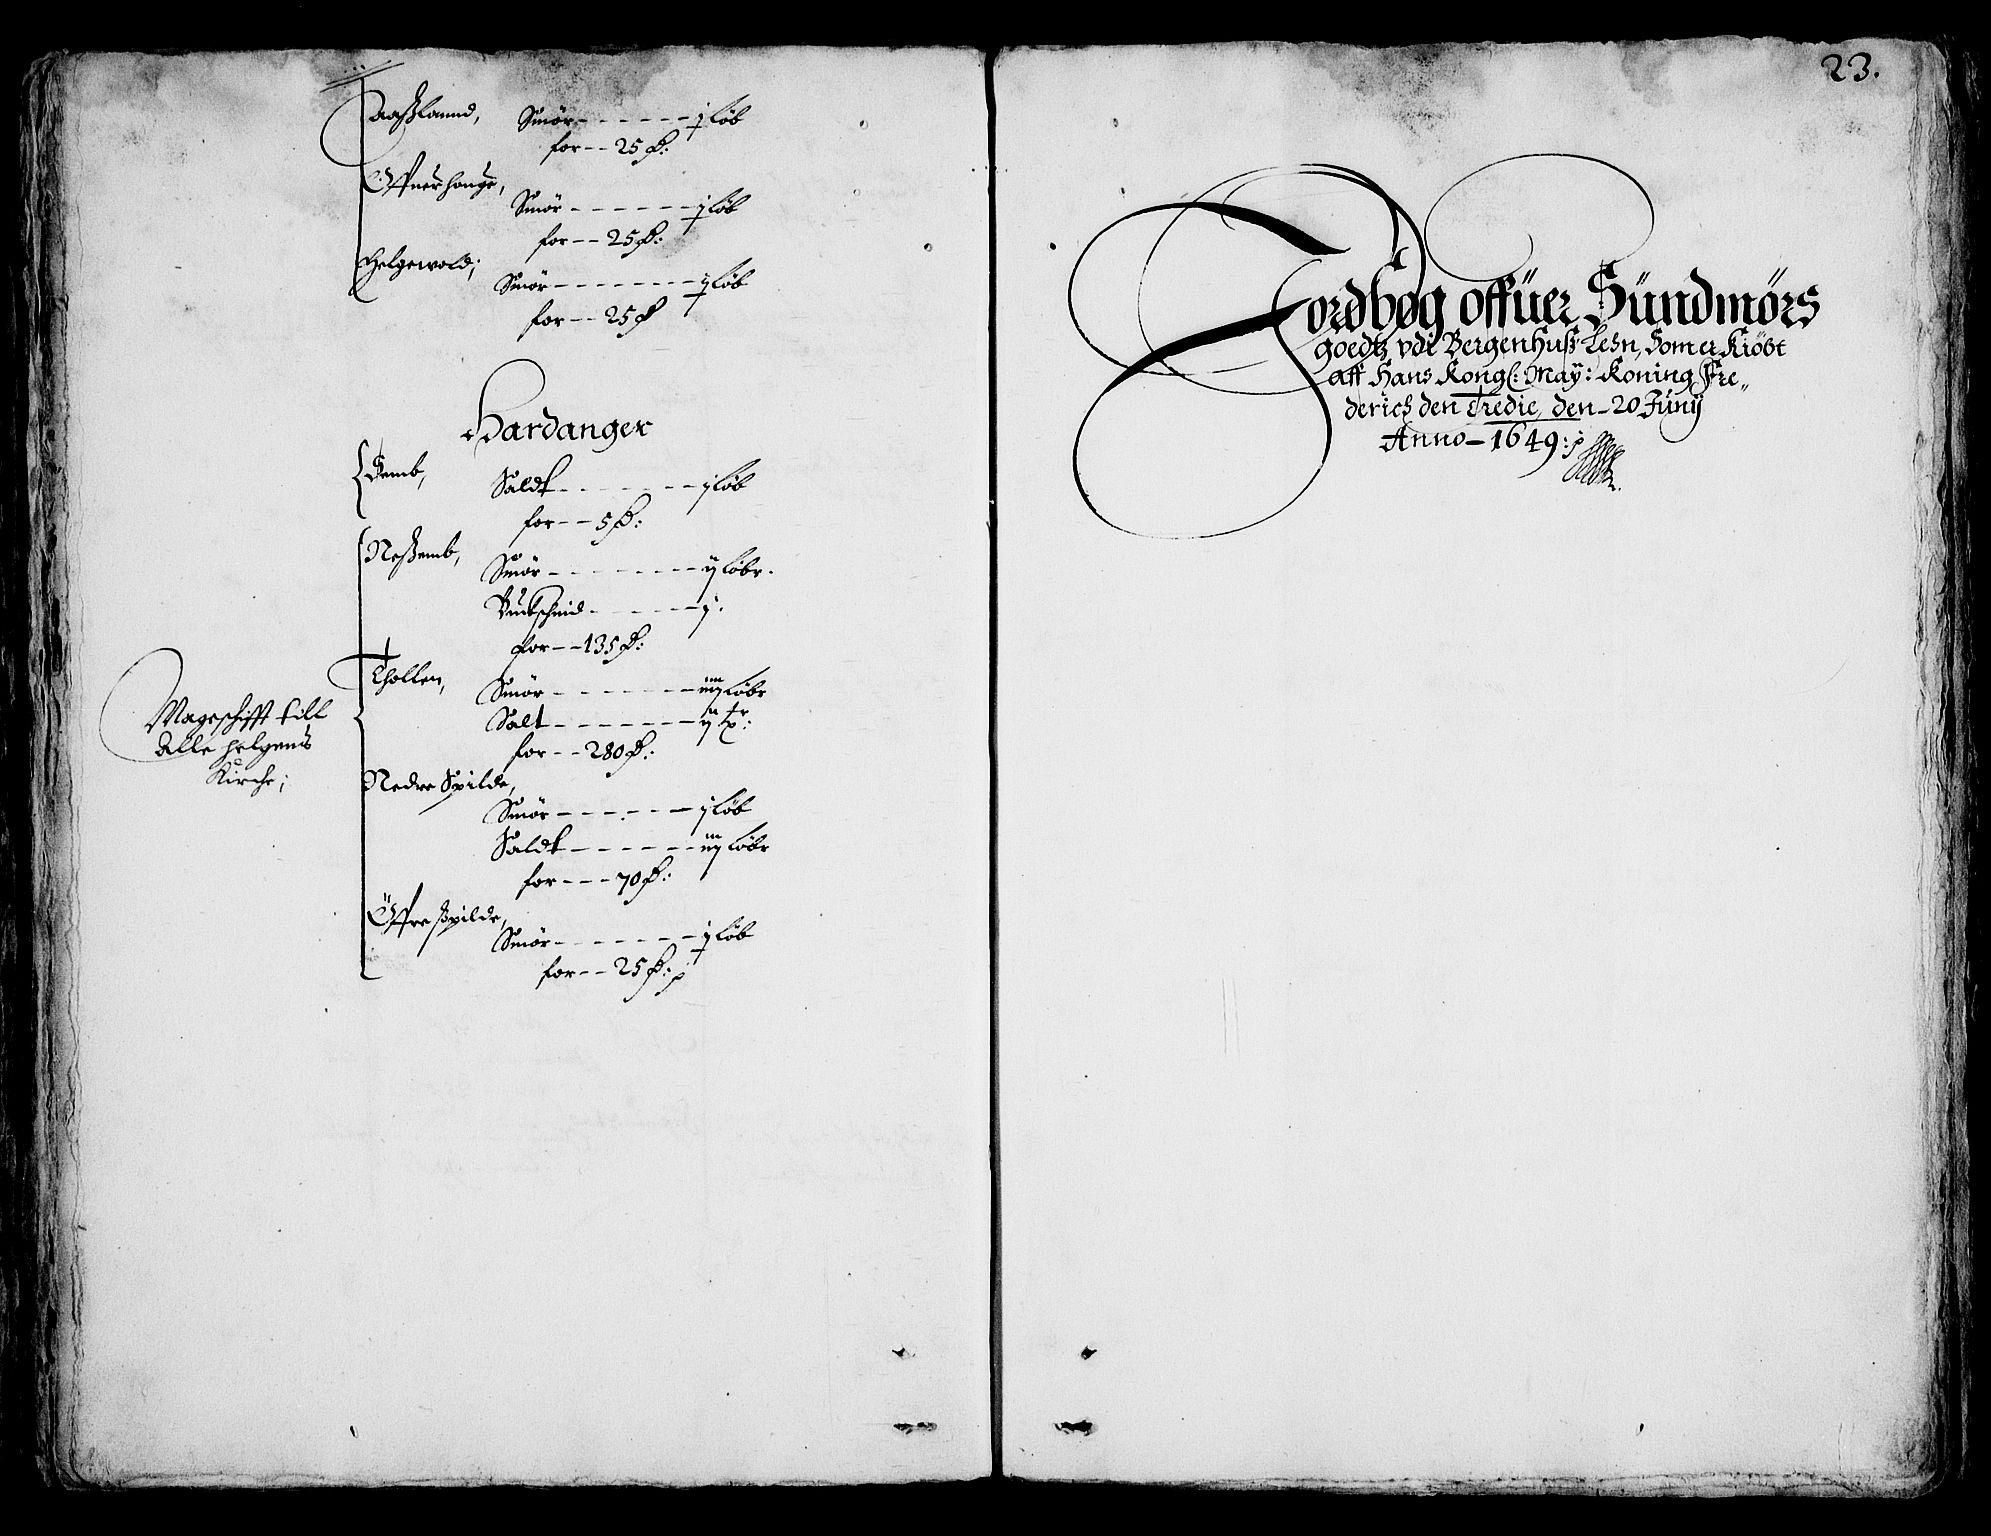 RA, Rentekammeret inntil 1814, Realistisk ordnet avdeling, On/L0001: Statens gods, 1651, s. 1022b-1023a